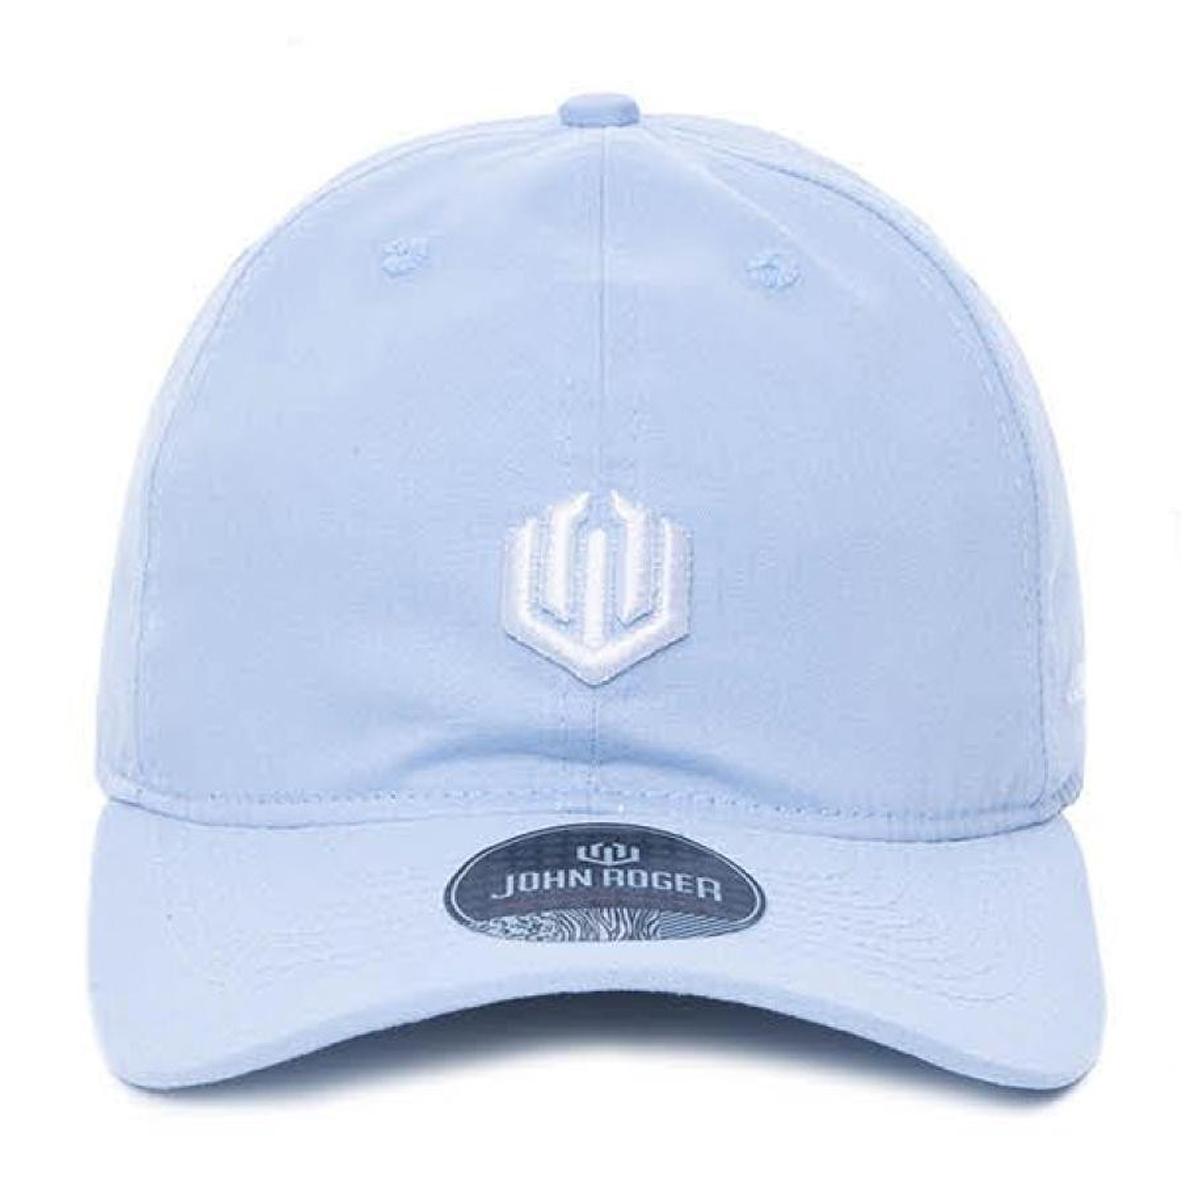 Boné John Roger - Azul C Dad hat